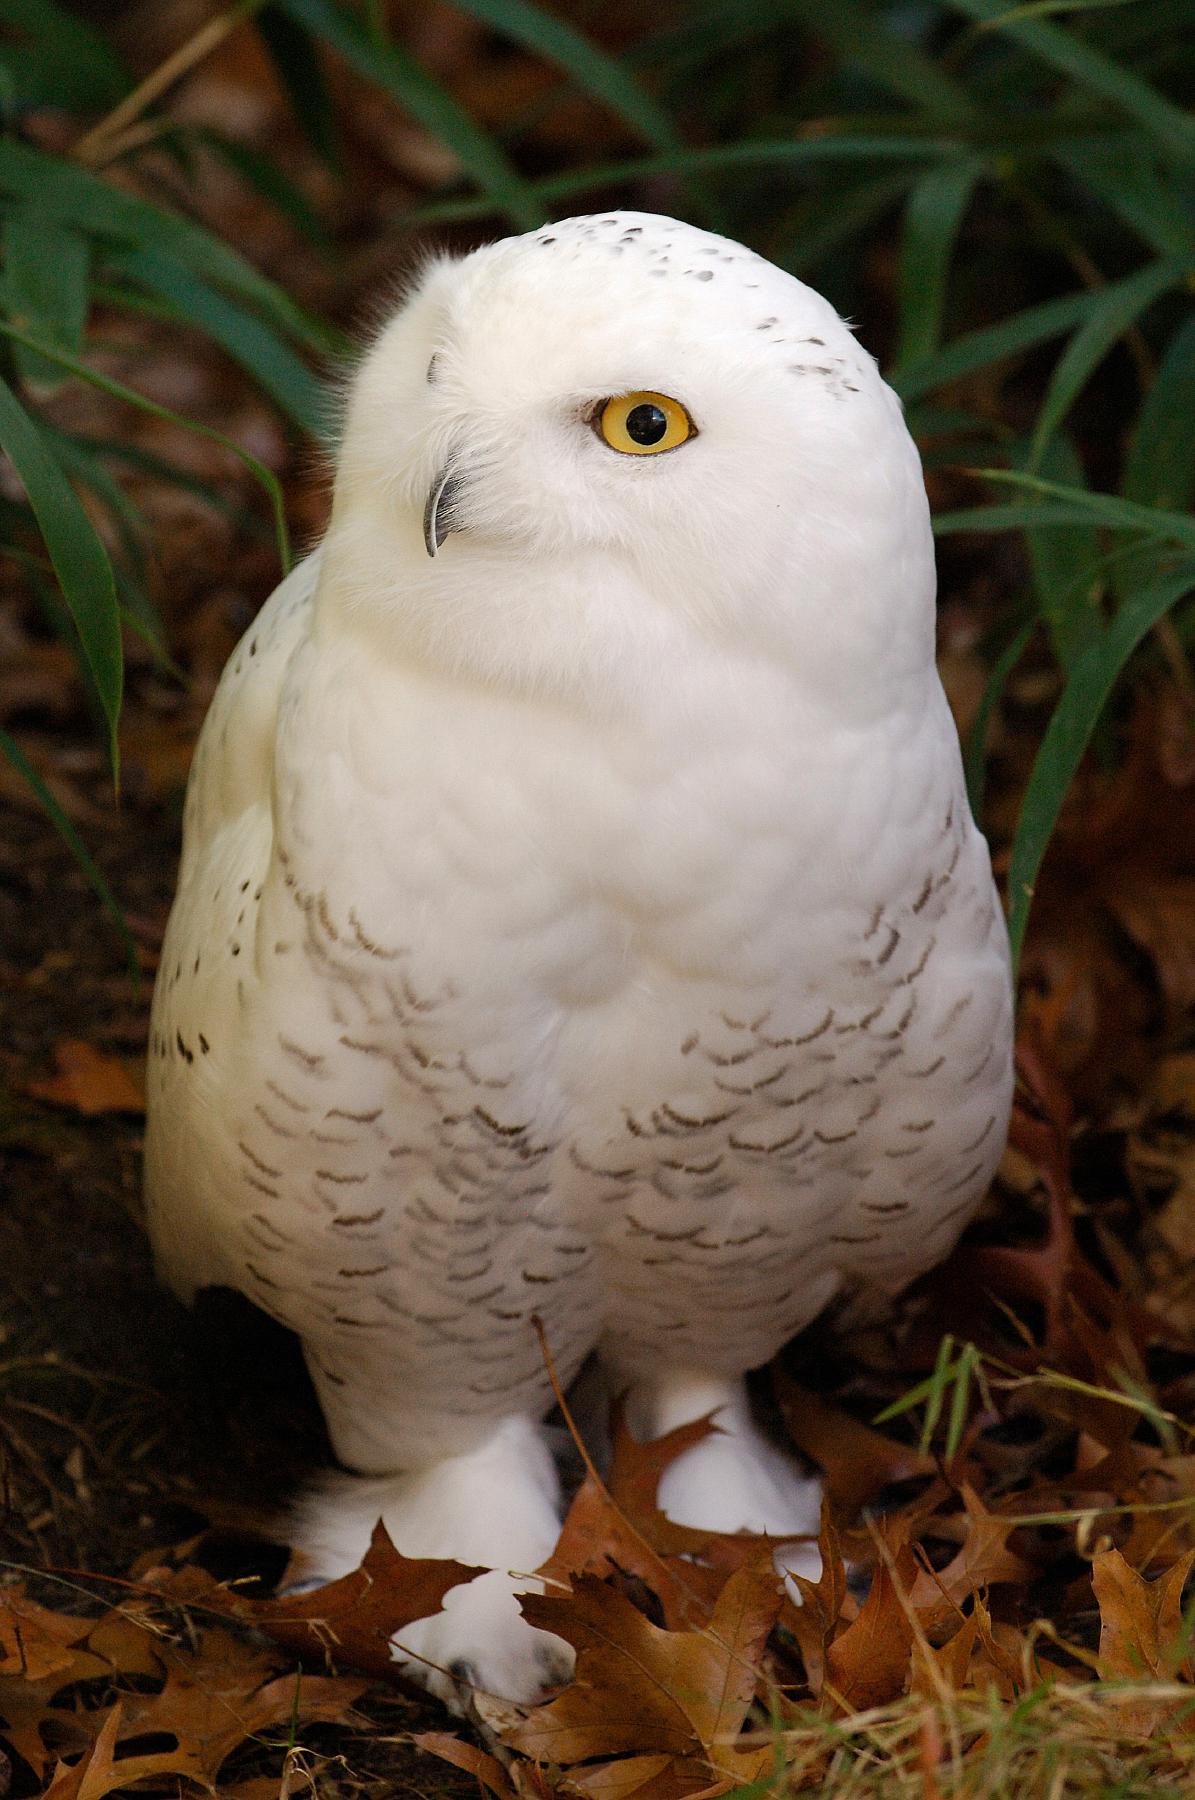 Julie-Larsen-Maher_0088_Snowy-Owl-in-Fall_11-17-05_hr